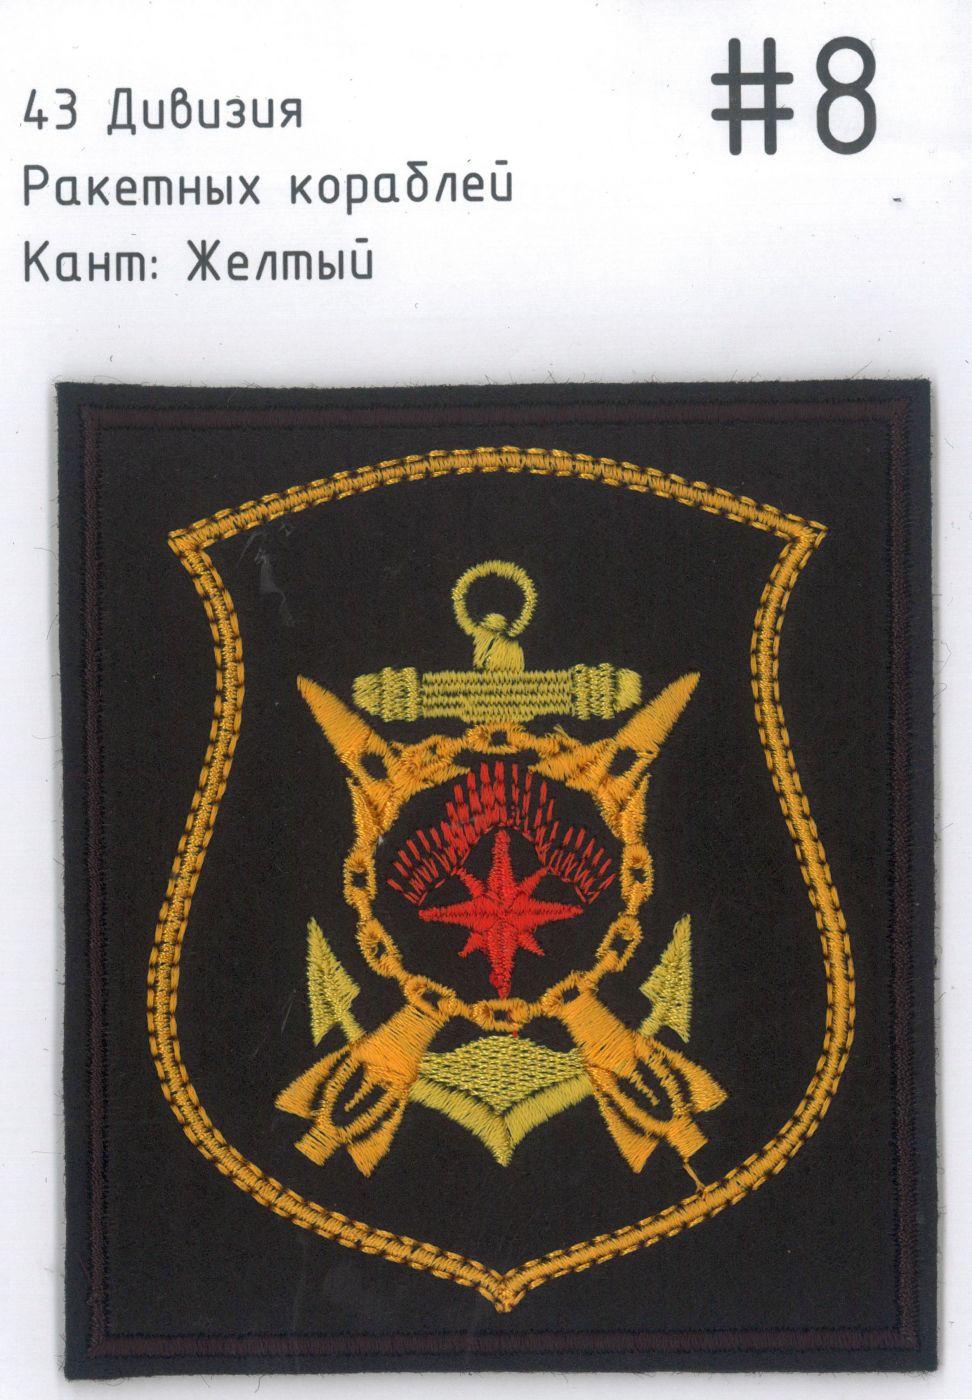 Шеврон 43 ДРК